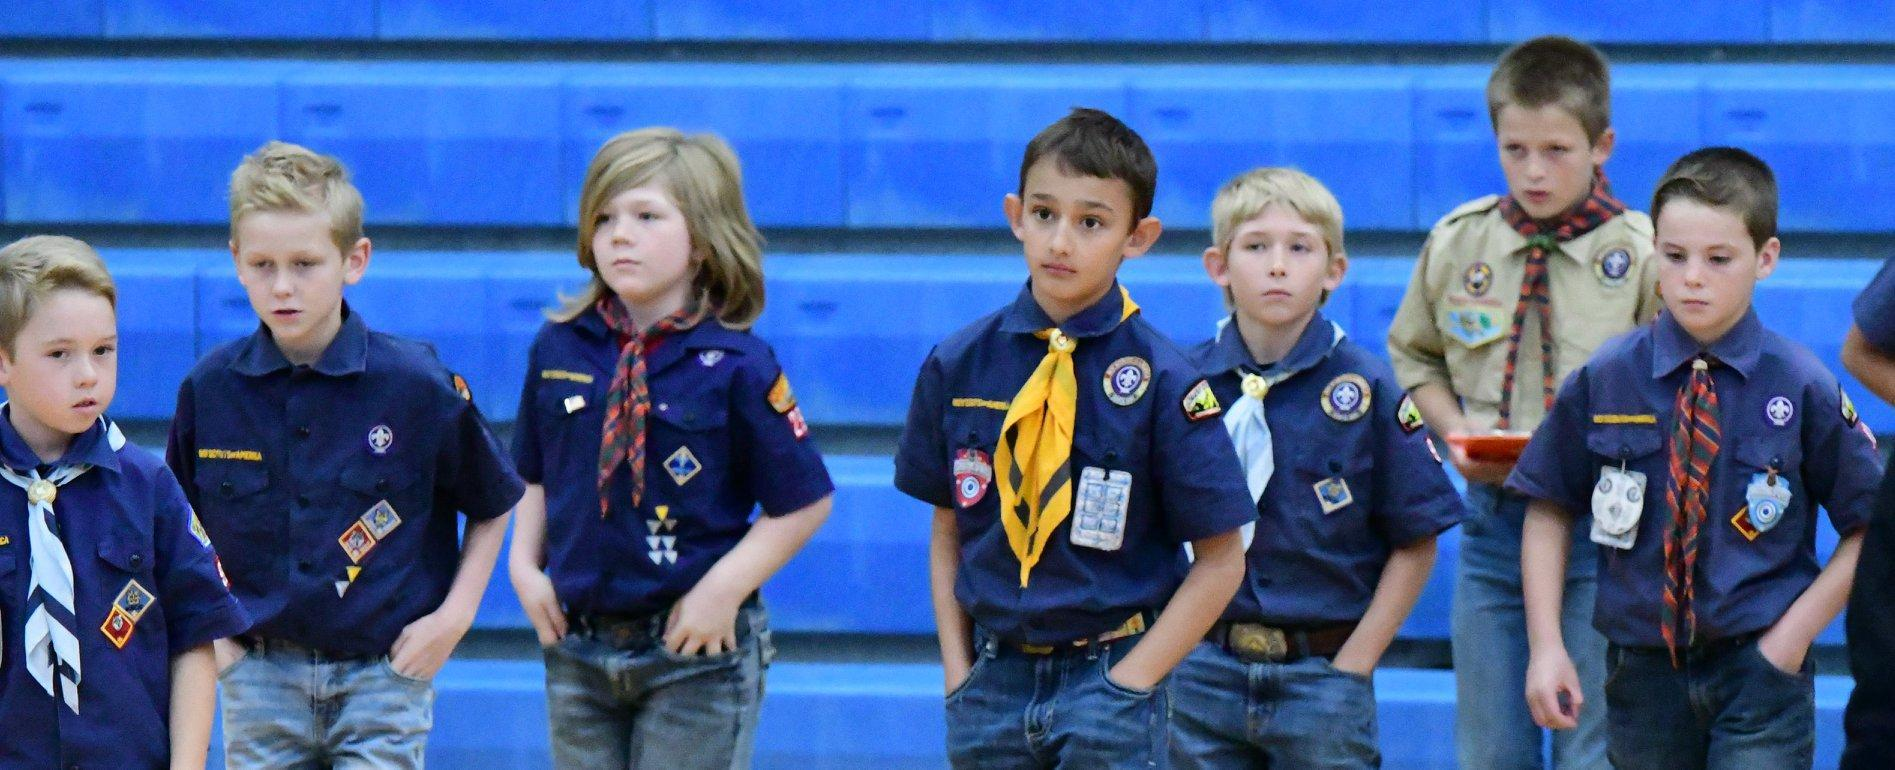 Cub Scouts present the flag